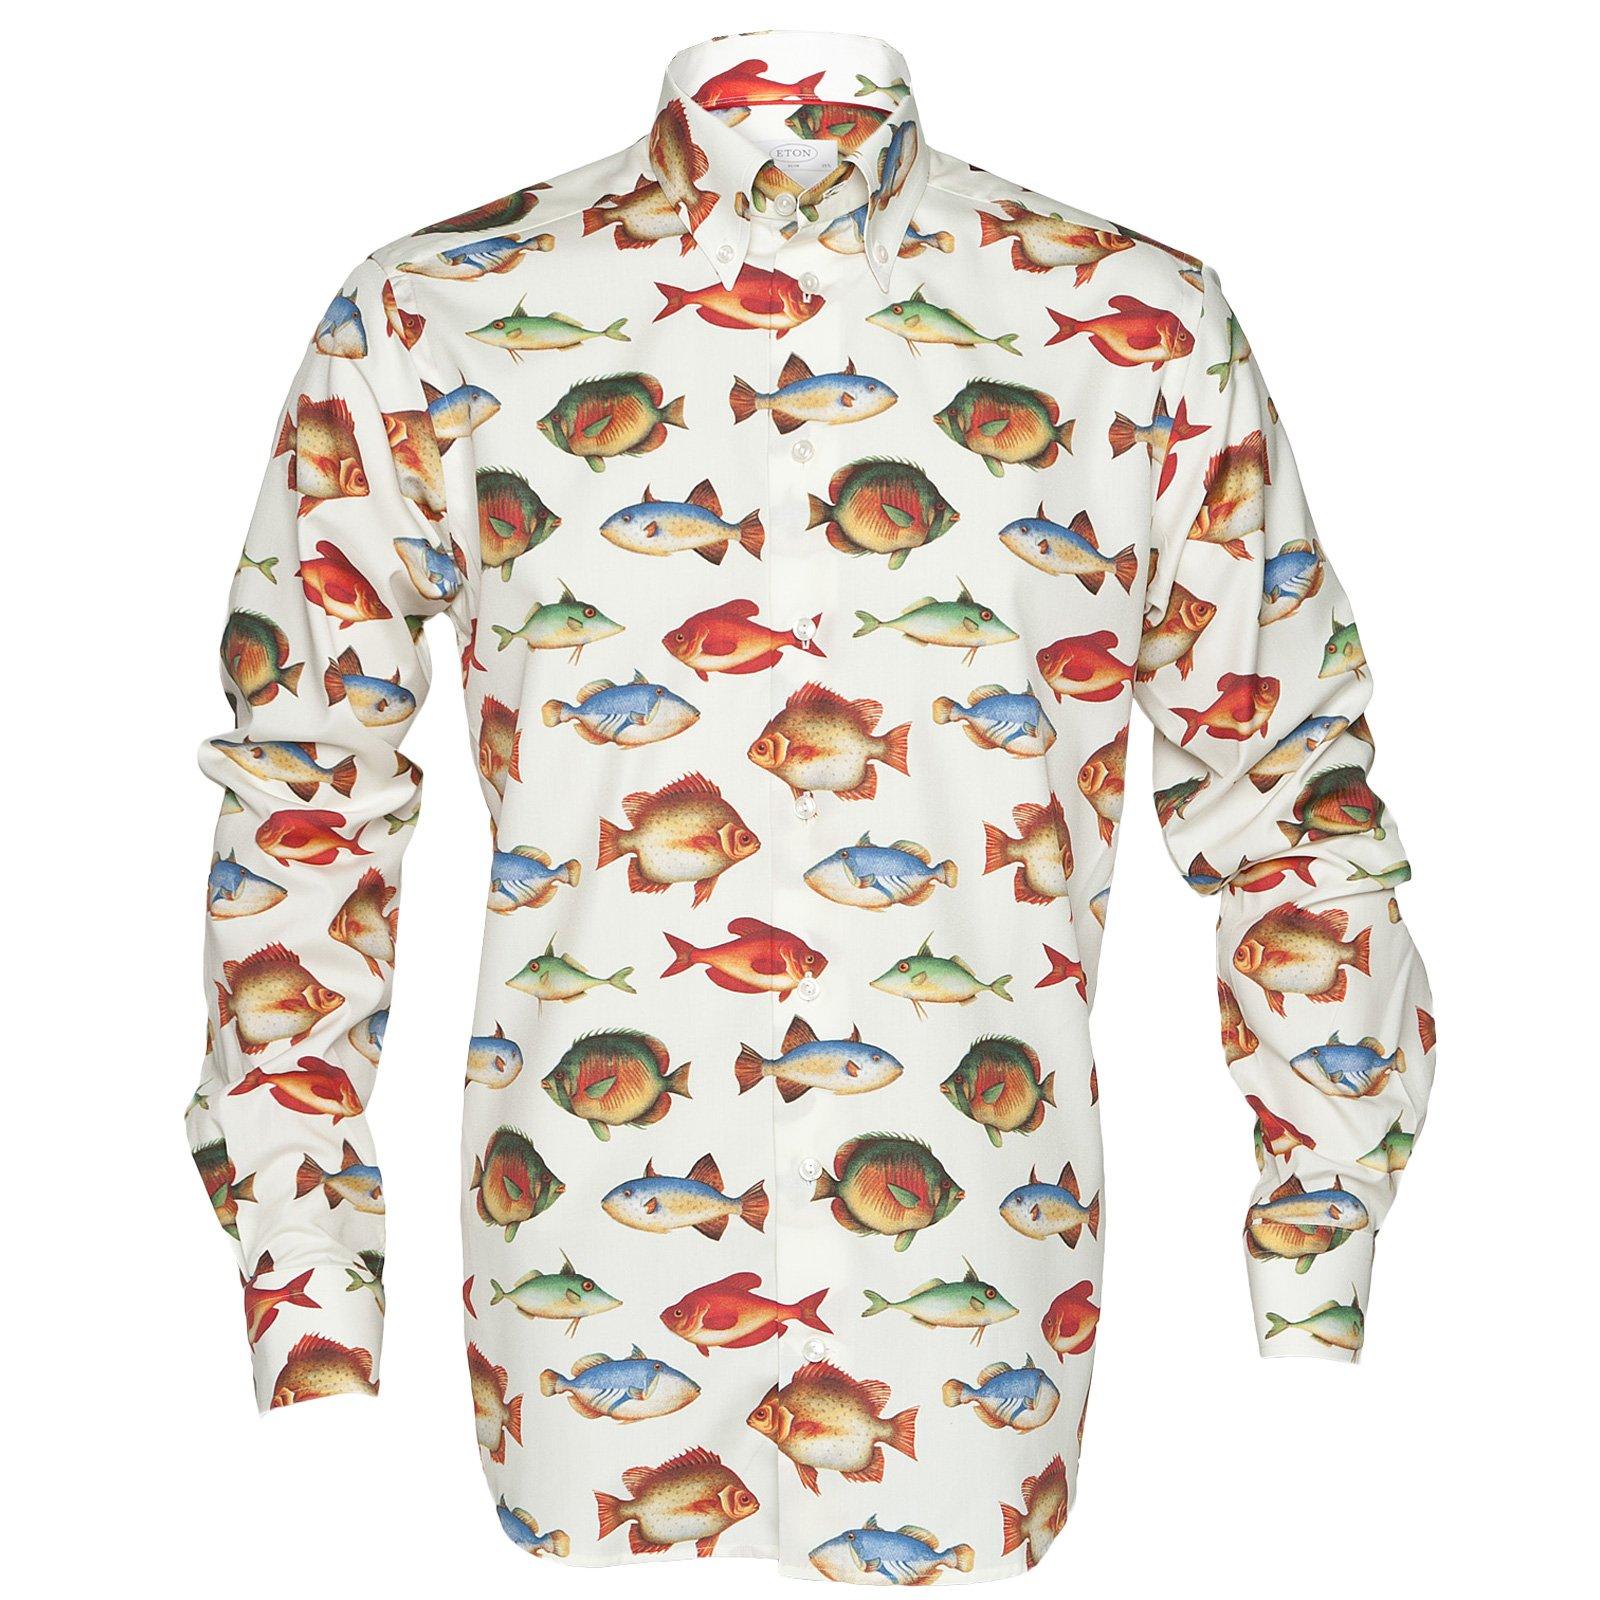 Luxury Cotton Fish Print Shirt Eton 2013aw C Shirts